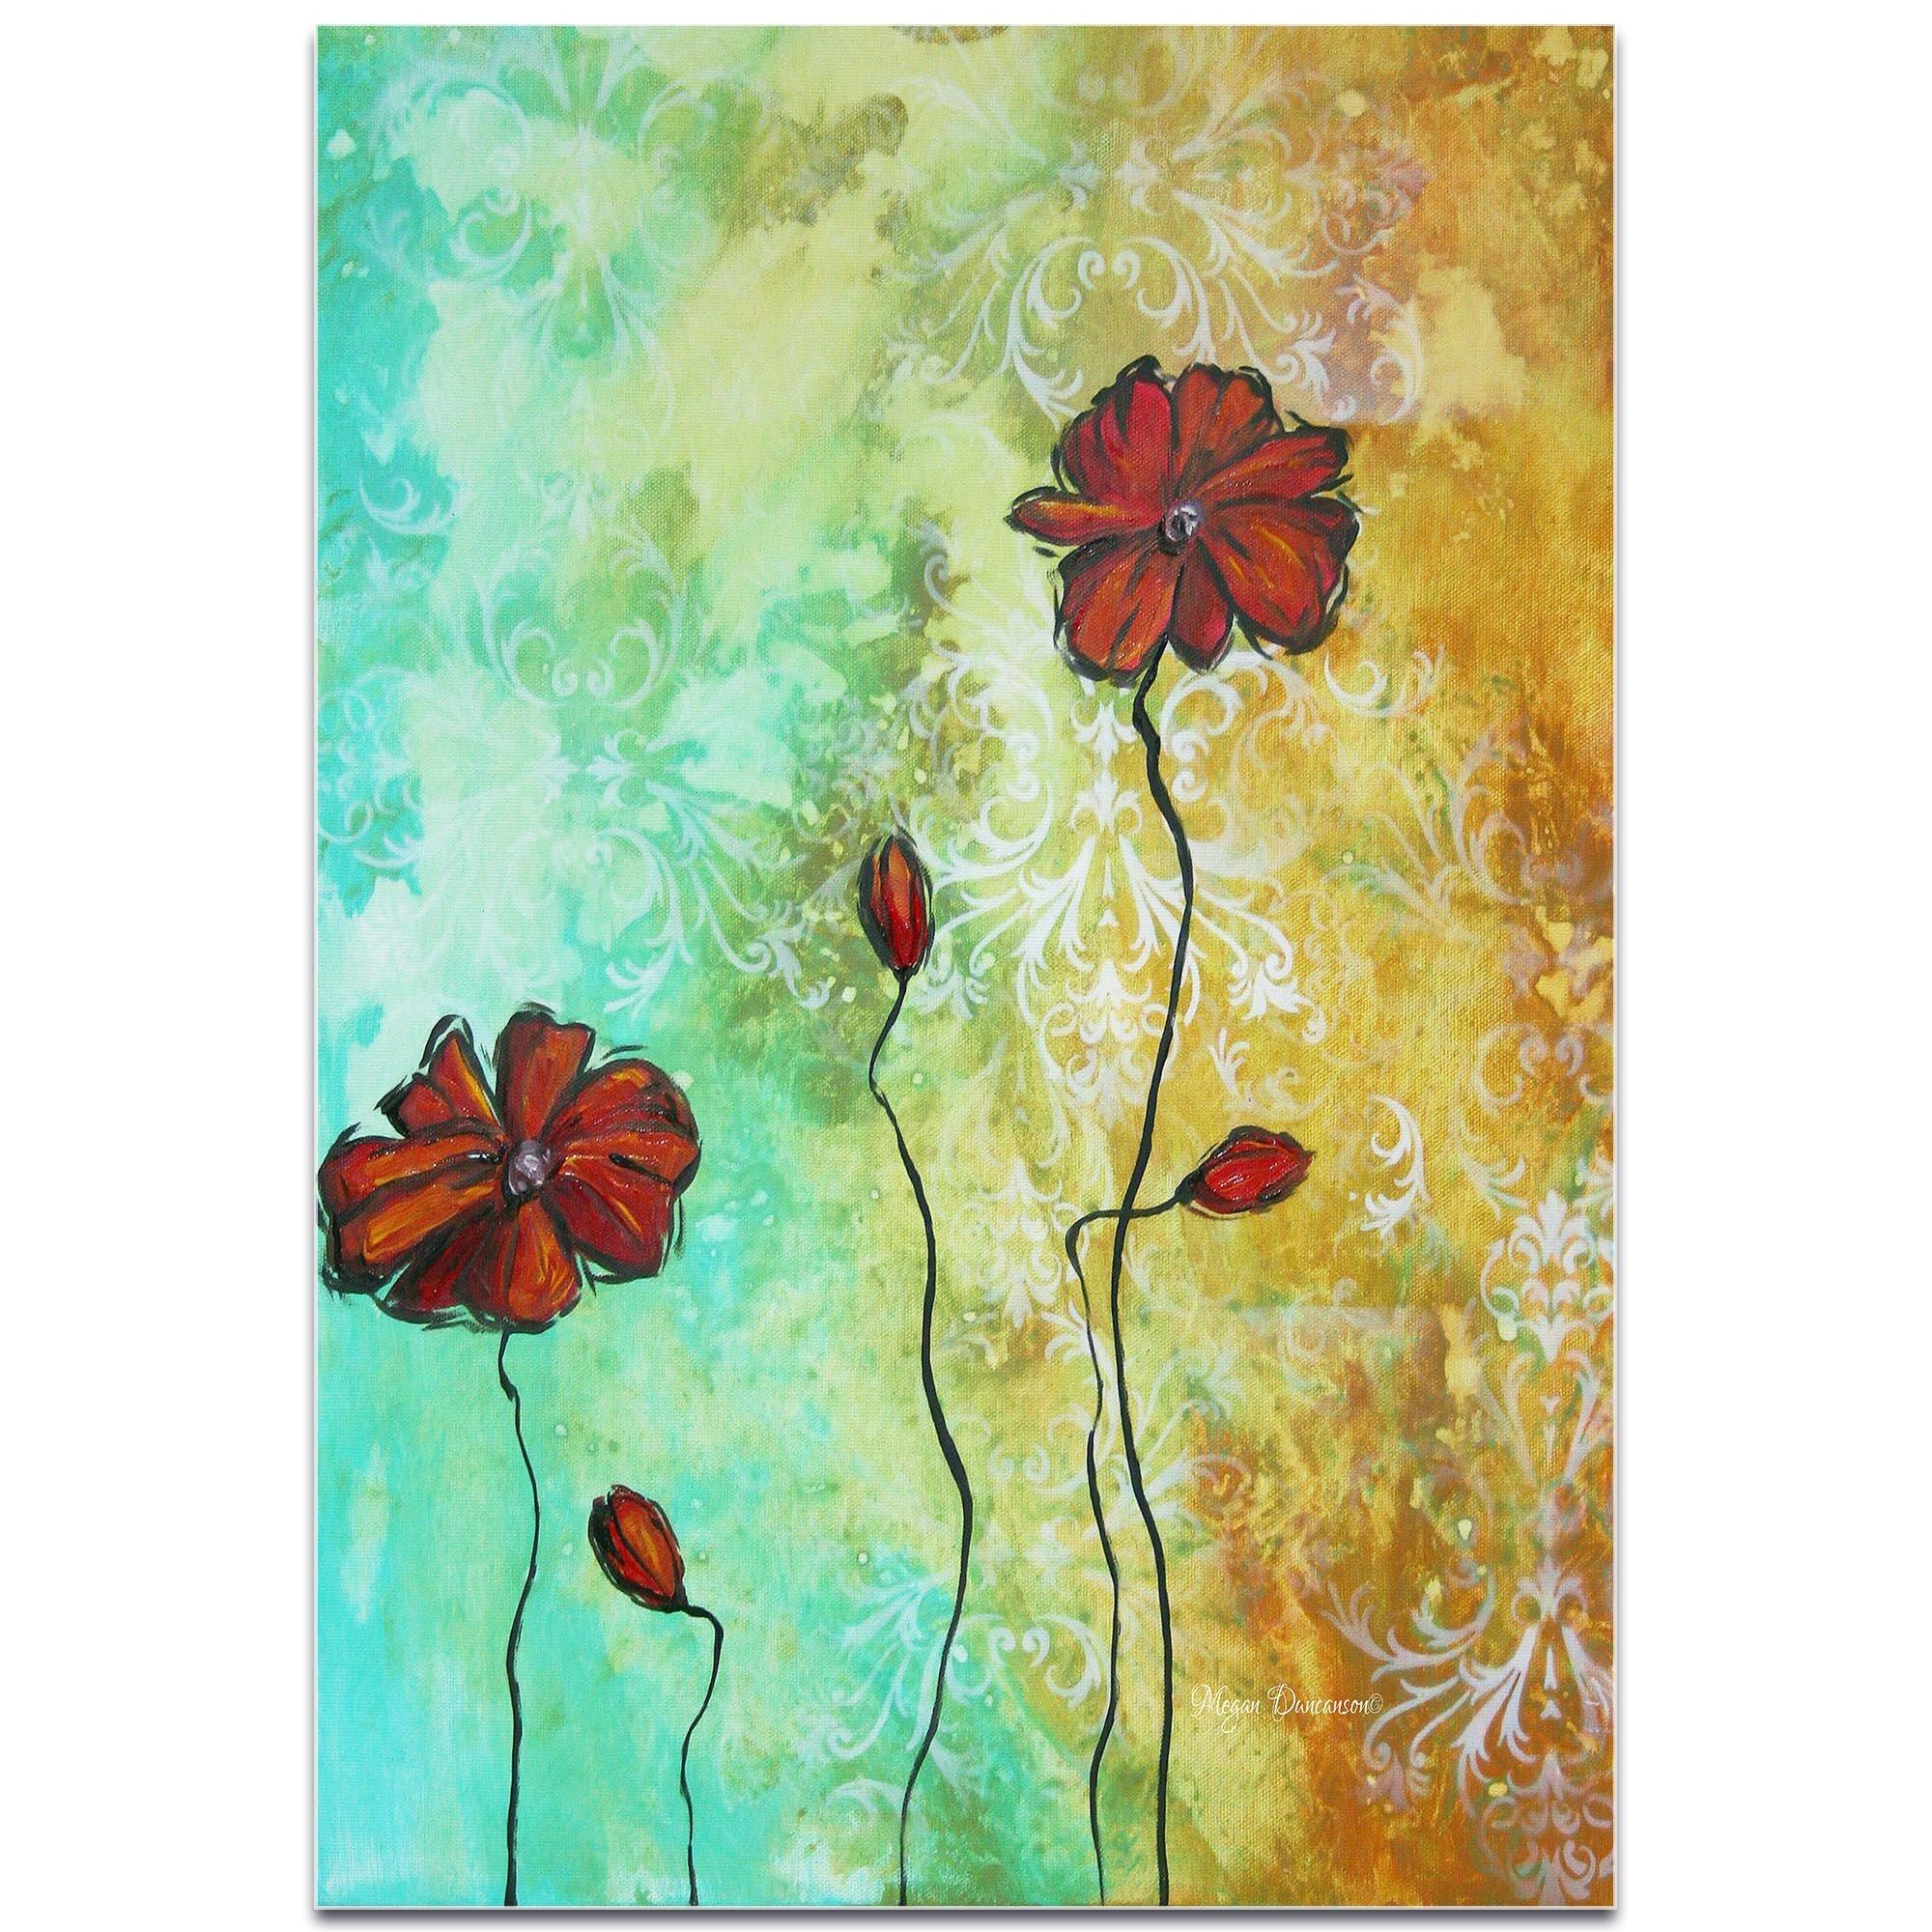 Metal Art Studio \'Poppy Love\' by Megan Duncanson High-Gloss Painting ...